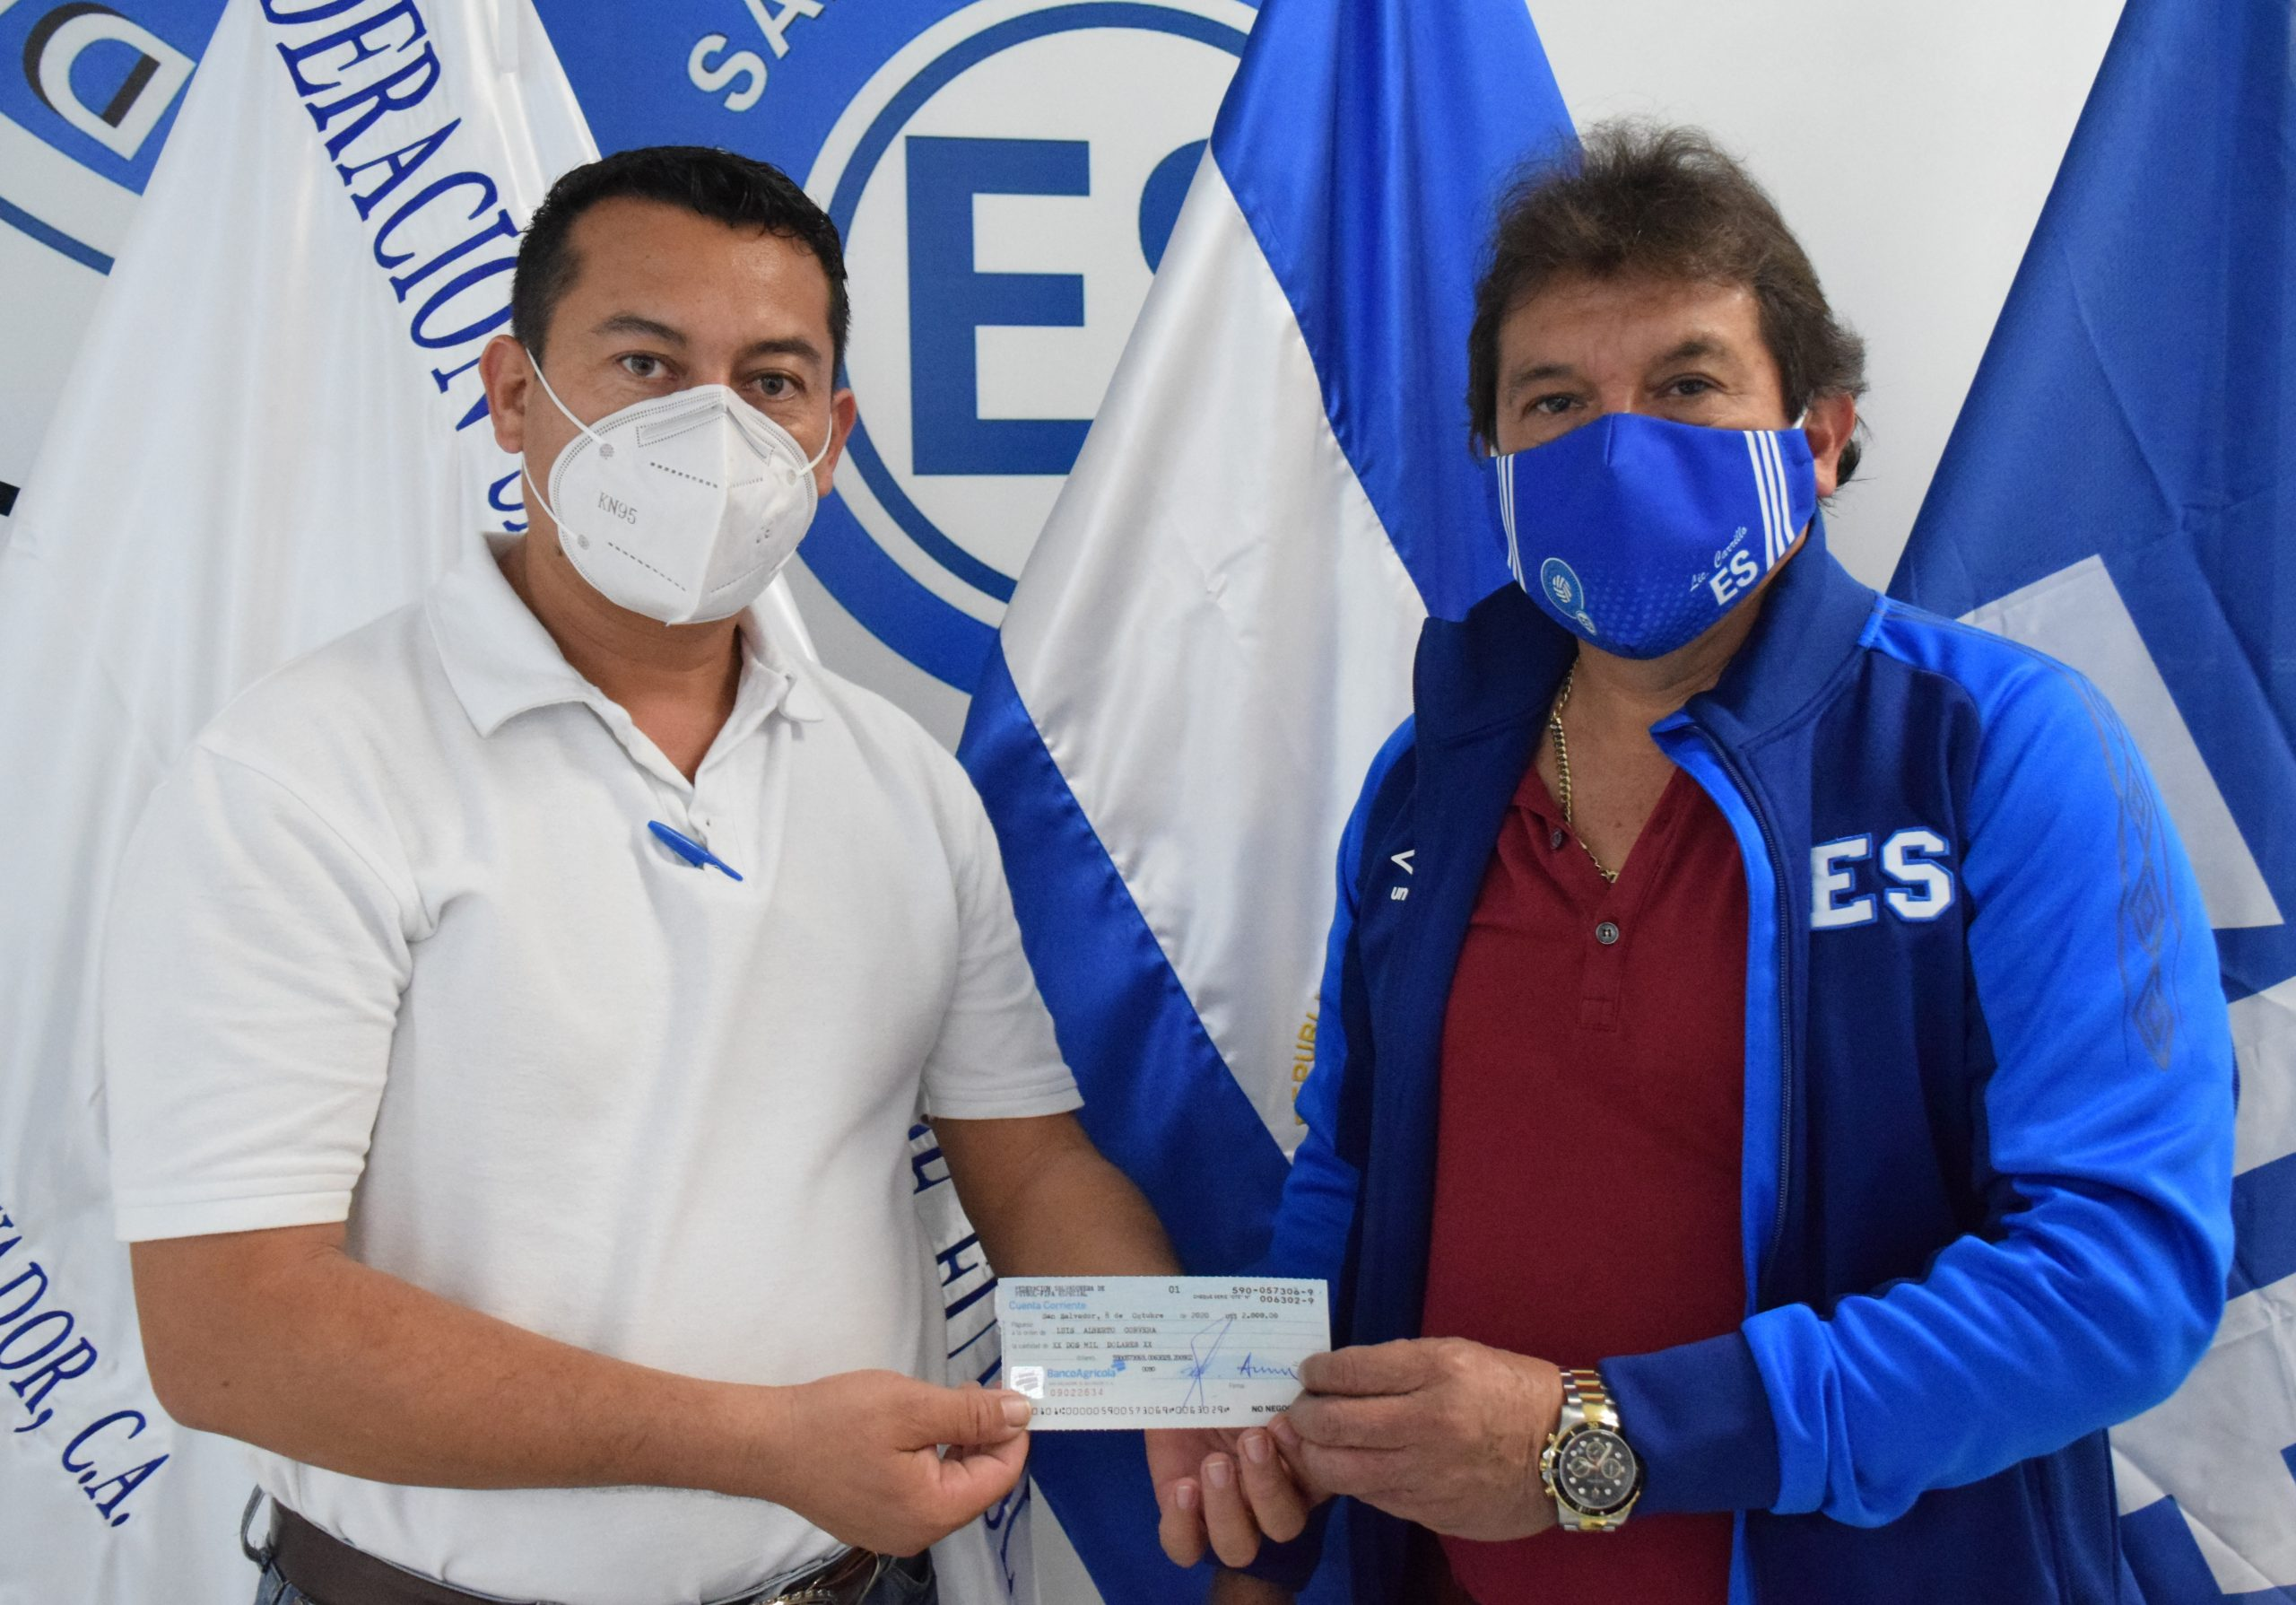 Señor Luis Corvera de Club Deportivo Atlético San Lorenzo, San Vicente